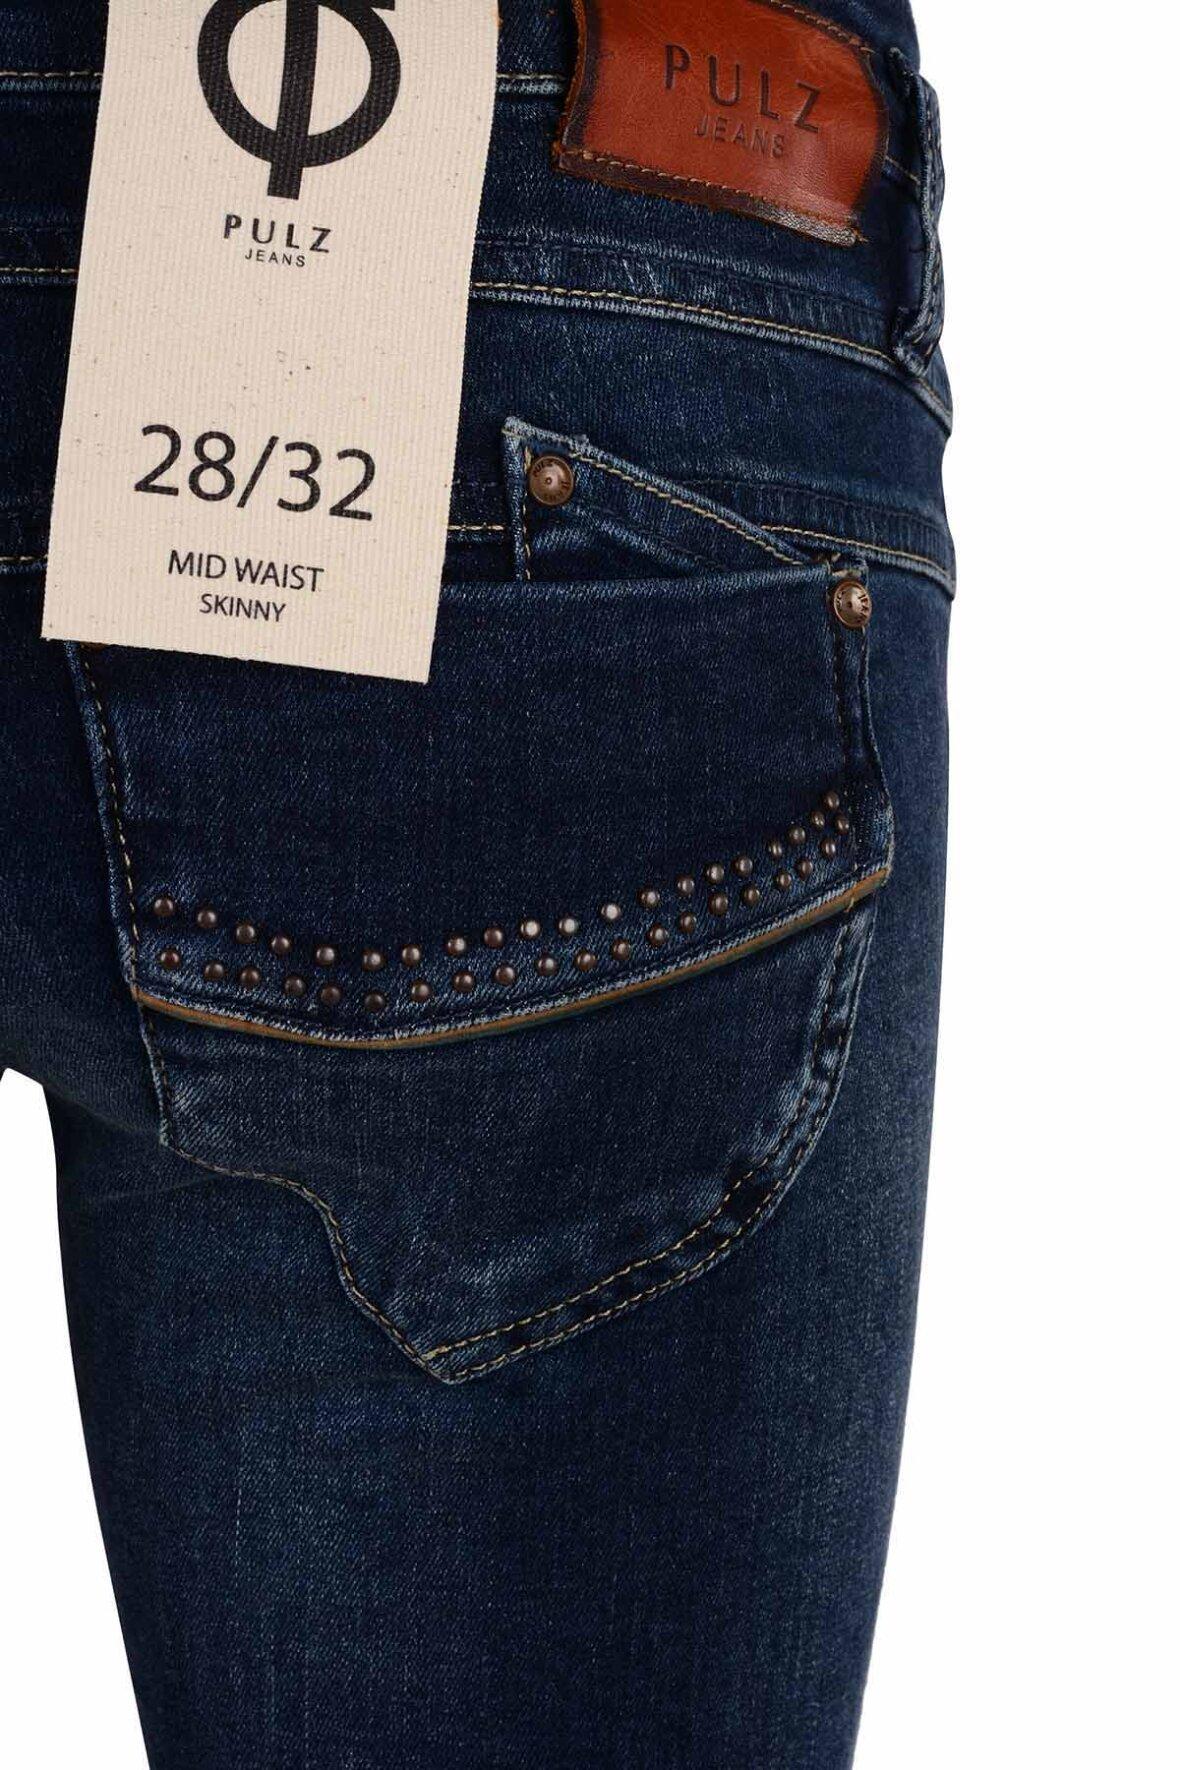 5505569d95b Pulz Anett Midwaist Skinny jeans stort udvalg - Hos Lohse